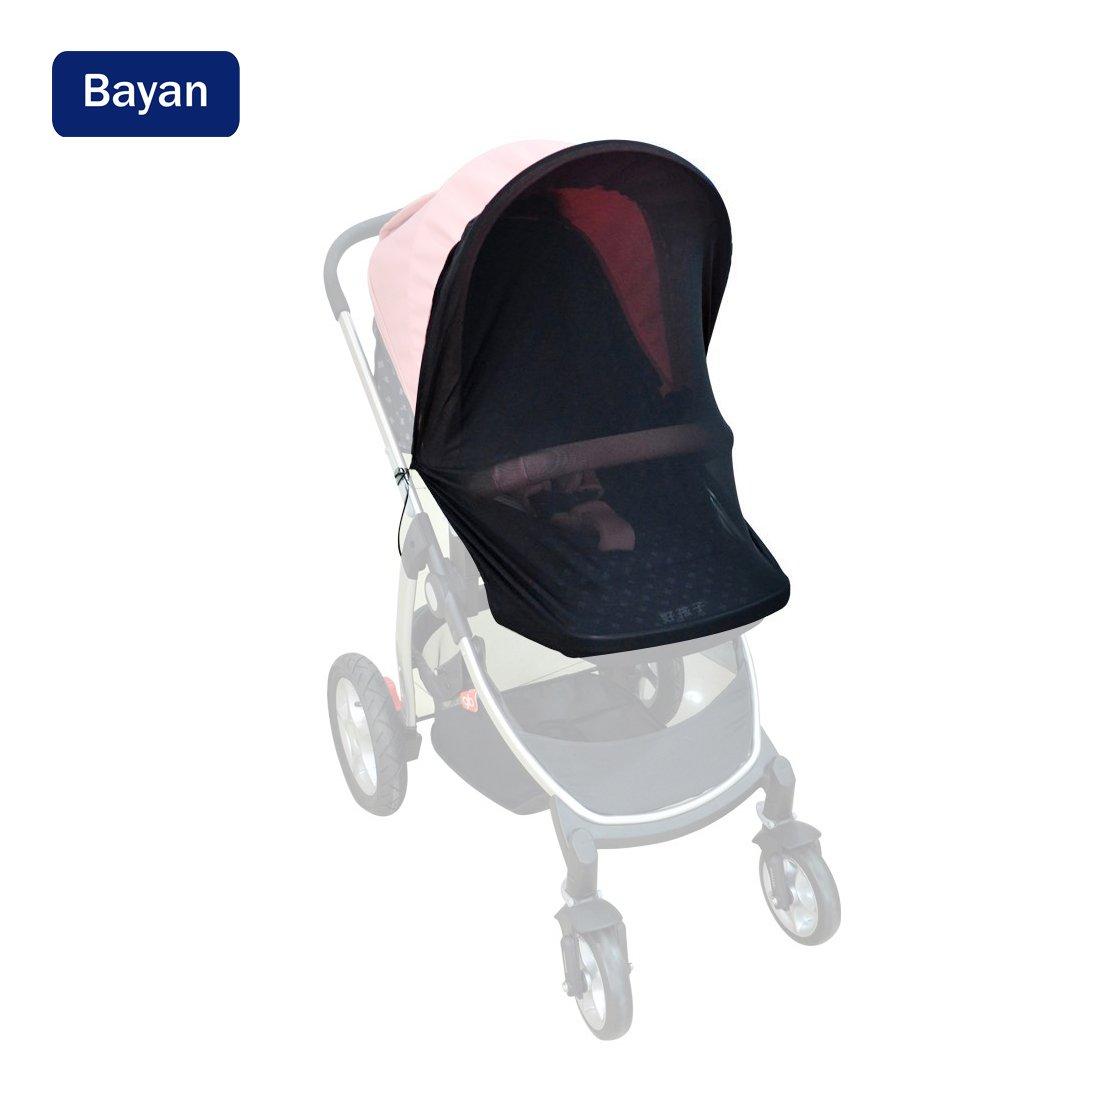 Canopy Stroller Sun Shade Baby Car Seat Sun Shade Cover Crib Net-Fits Most Single  sc 1 st  Amazon.com & Amazon.com : Manito Sun Shade for Strollers and Car Seats - Black ...